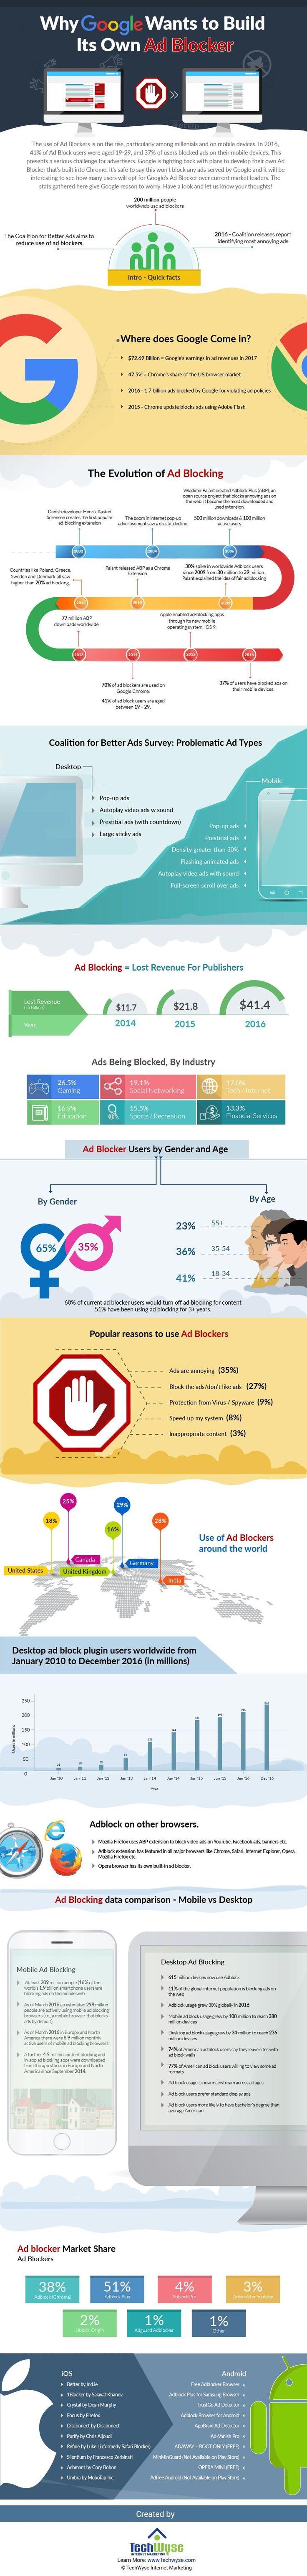 http://www.digitalinformationworld.com/2017/07/google-adblocker-infographic.html